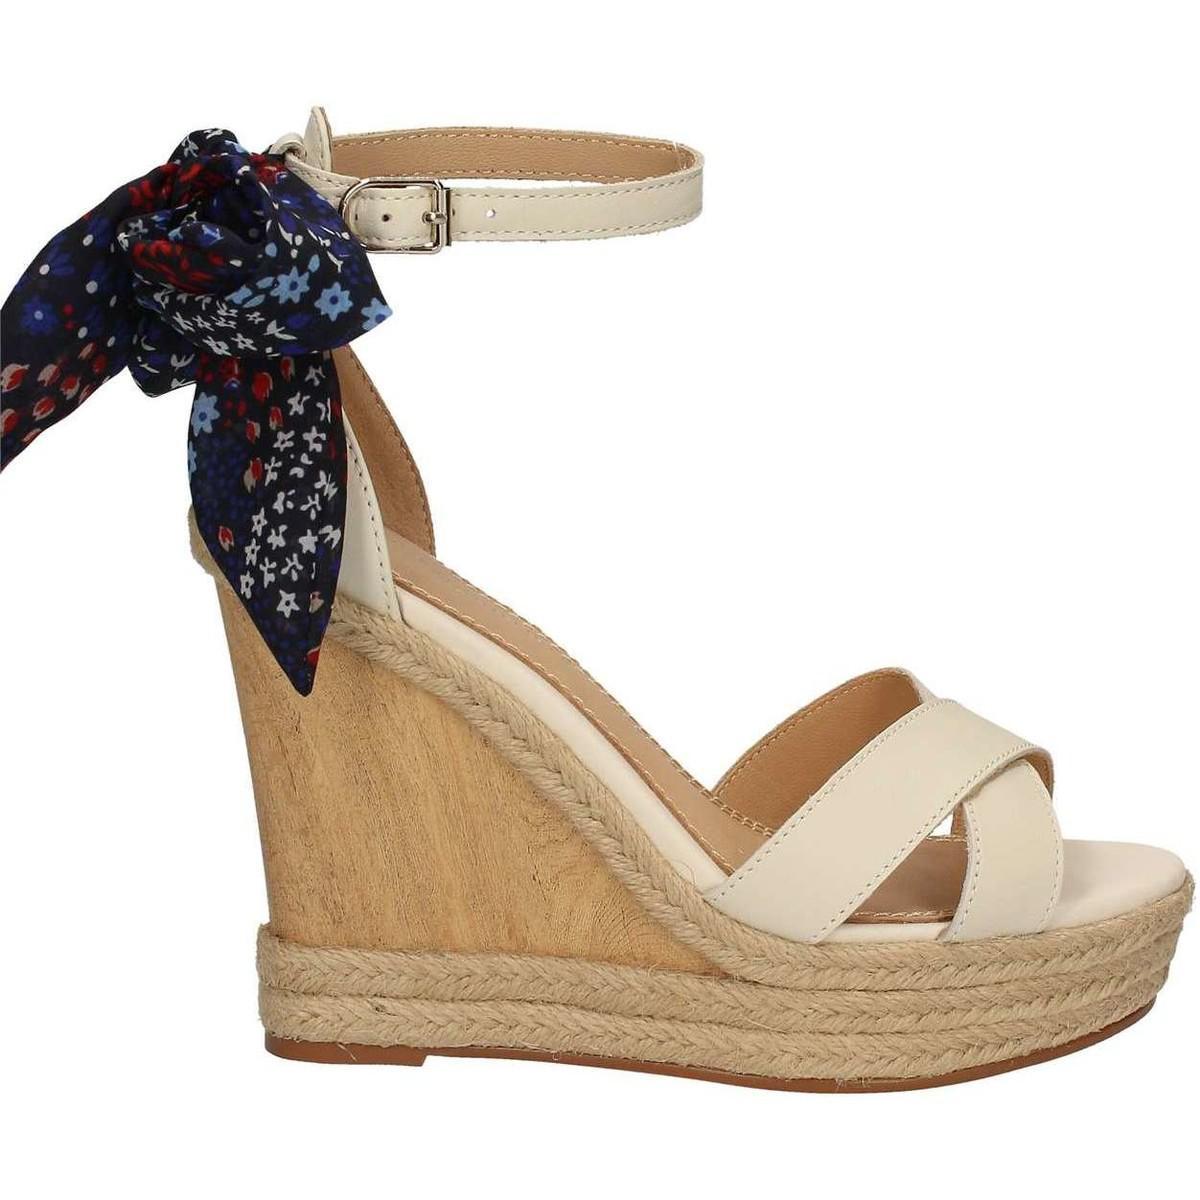 1b16e7552196 Tommy Hilfiger Fw0fw00663 Wedge Sandals Women White Women s Sandals ...